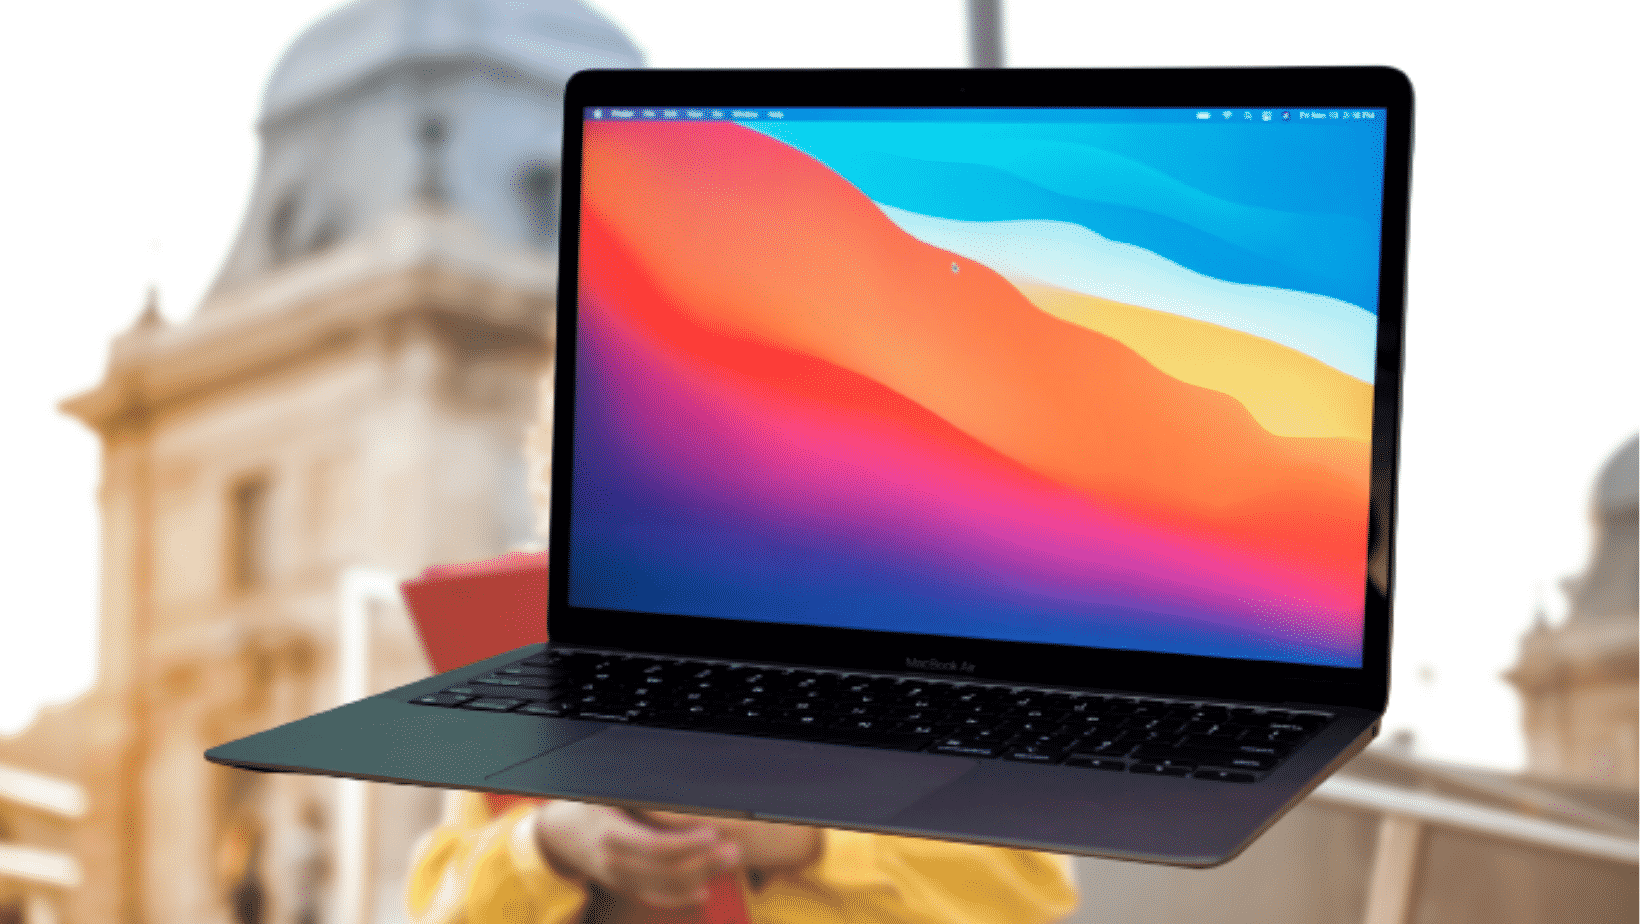 student's laptop